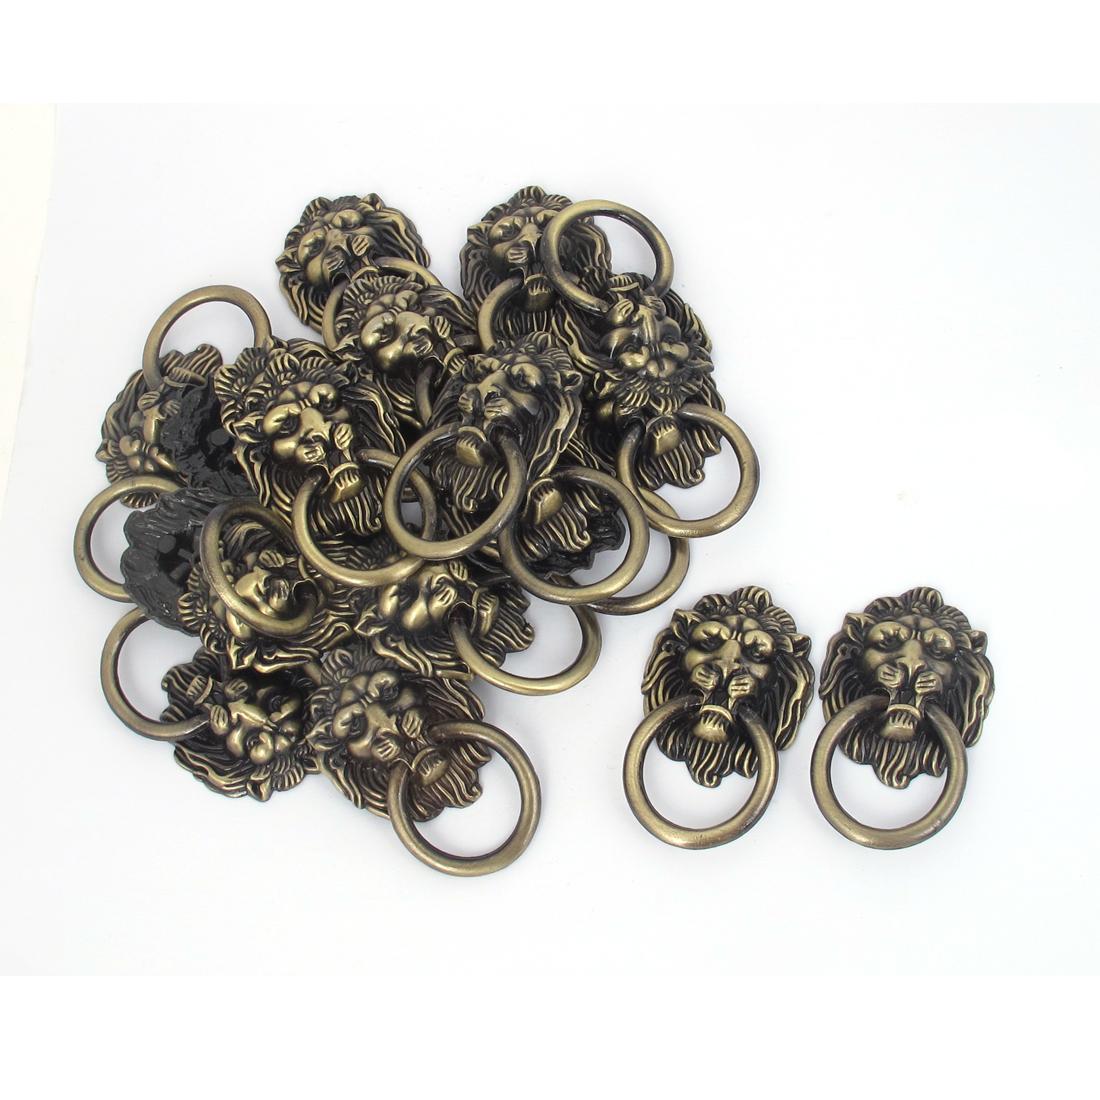 Lion Head Shape 4mm Male Thread Dia Zinc Alloy Door Handle Bronze Tone 20 Pcs